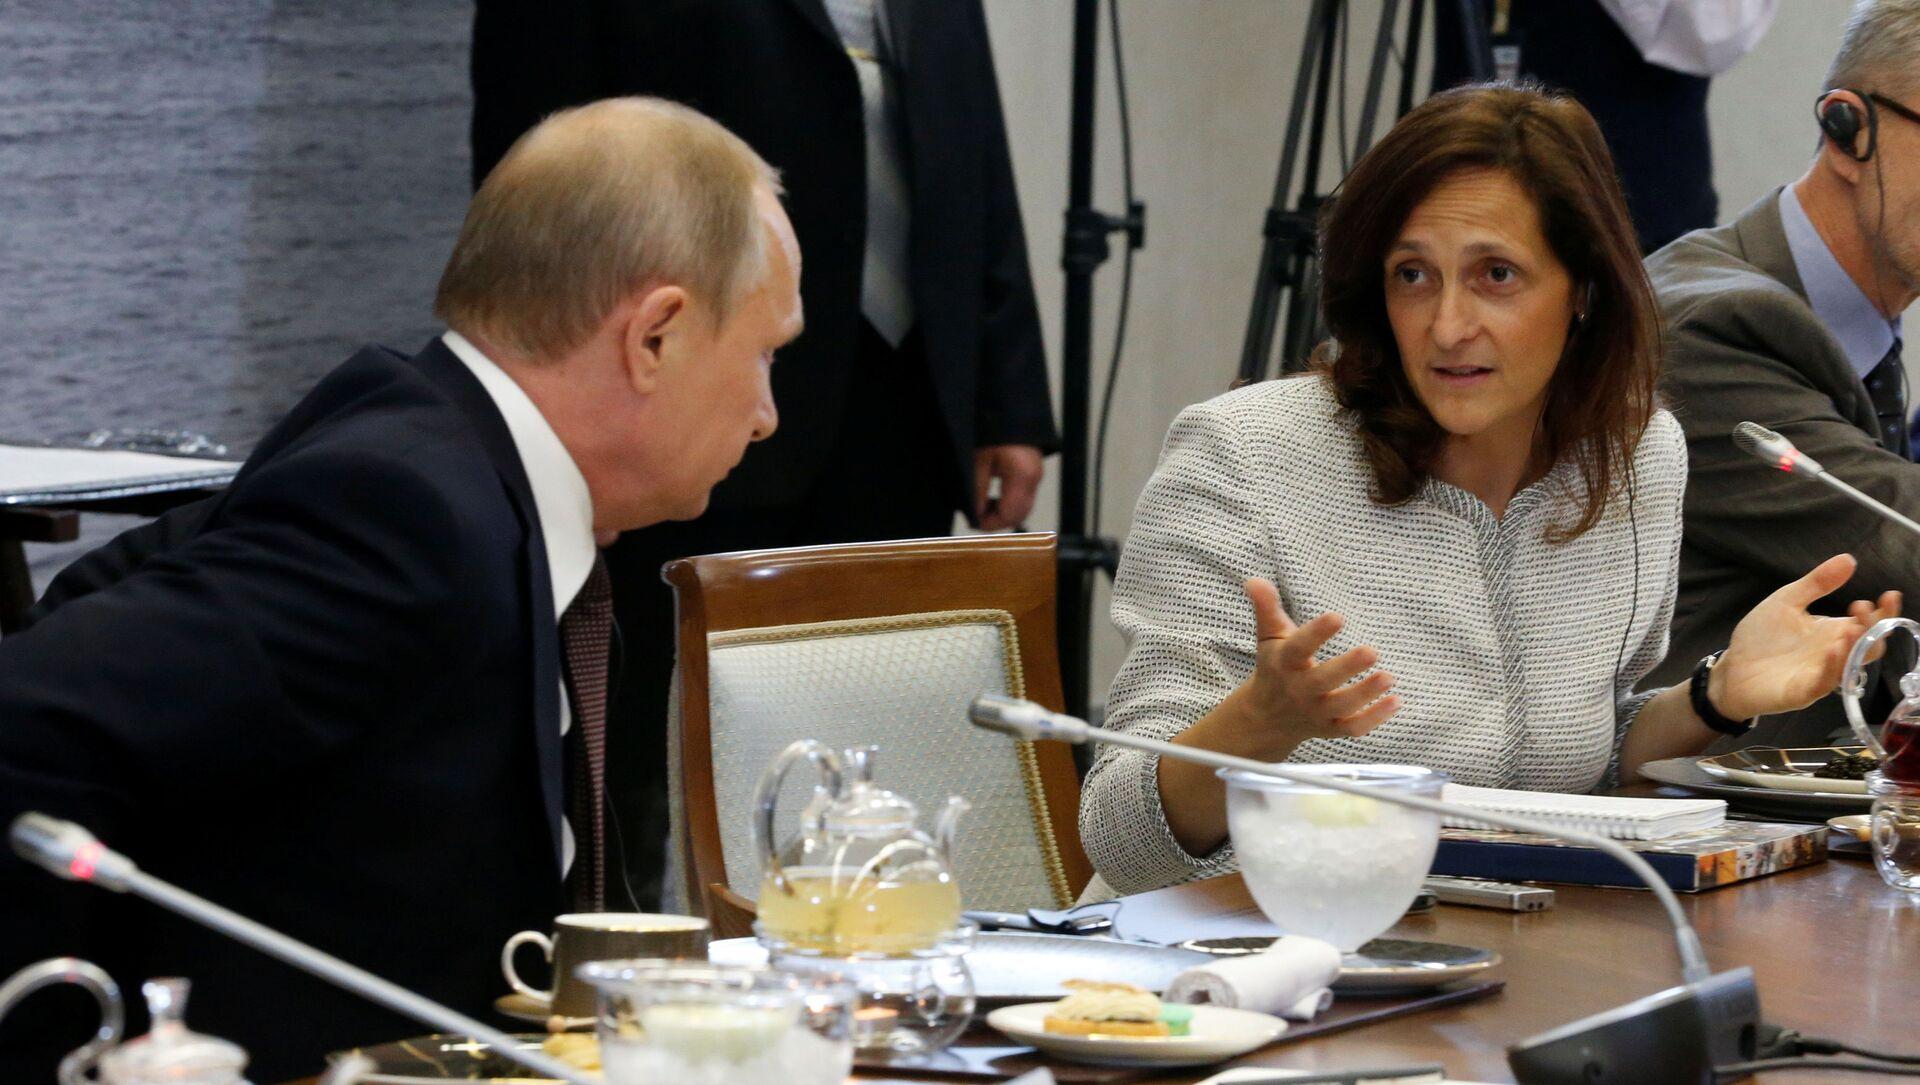 Putin e Alessandra Galloni - Sputnik Italia, 1920, 13.04.2021